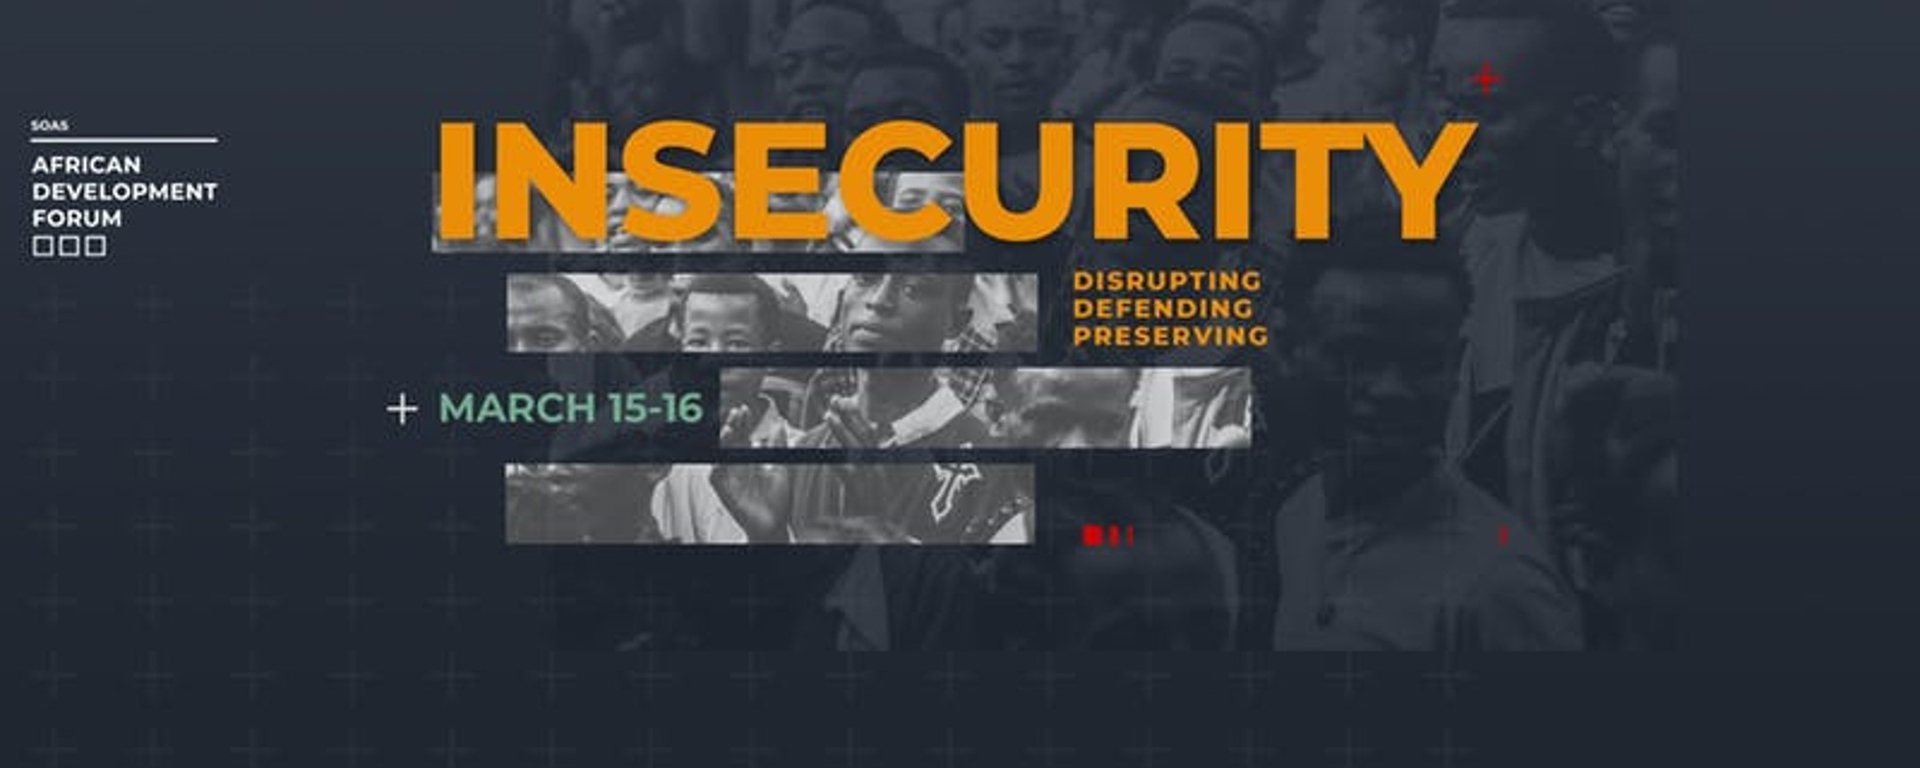 SOAS African Development Forum - SOAS African Development Forum 2019 : Insecurity Movemeback African event cover image